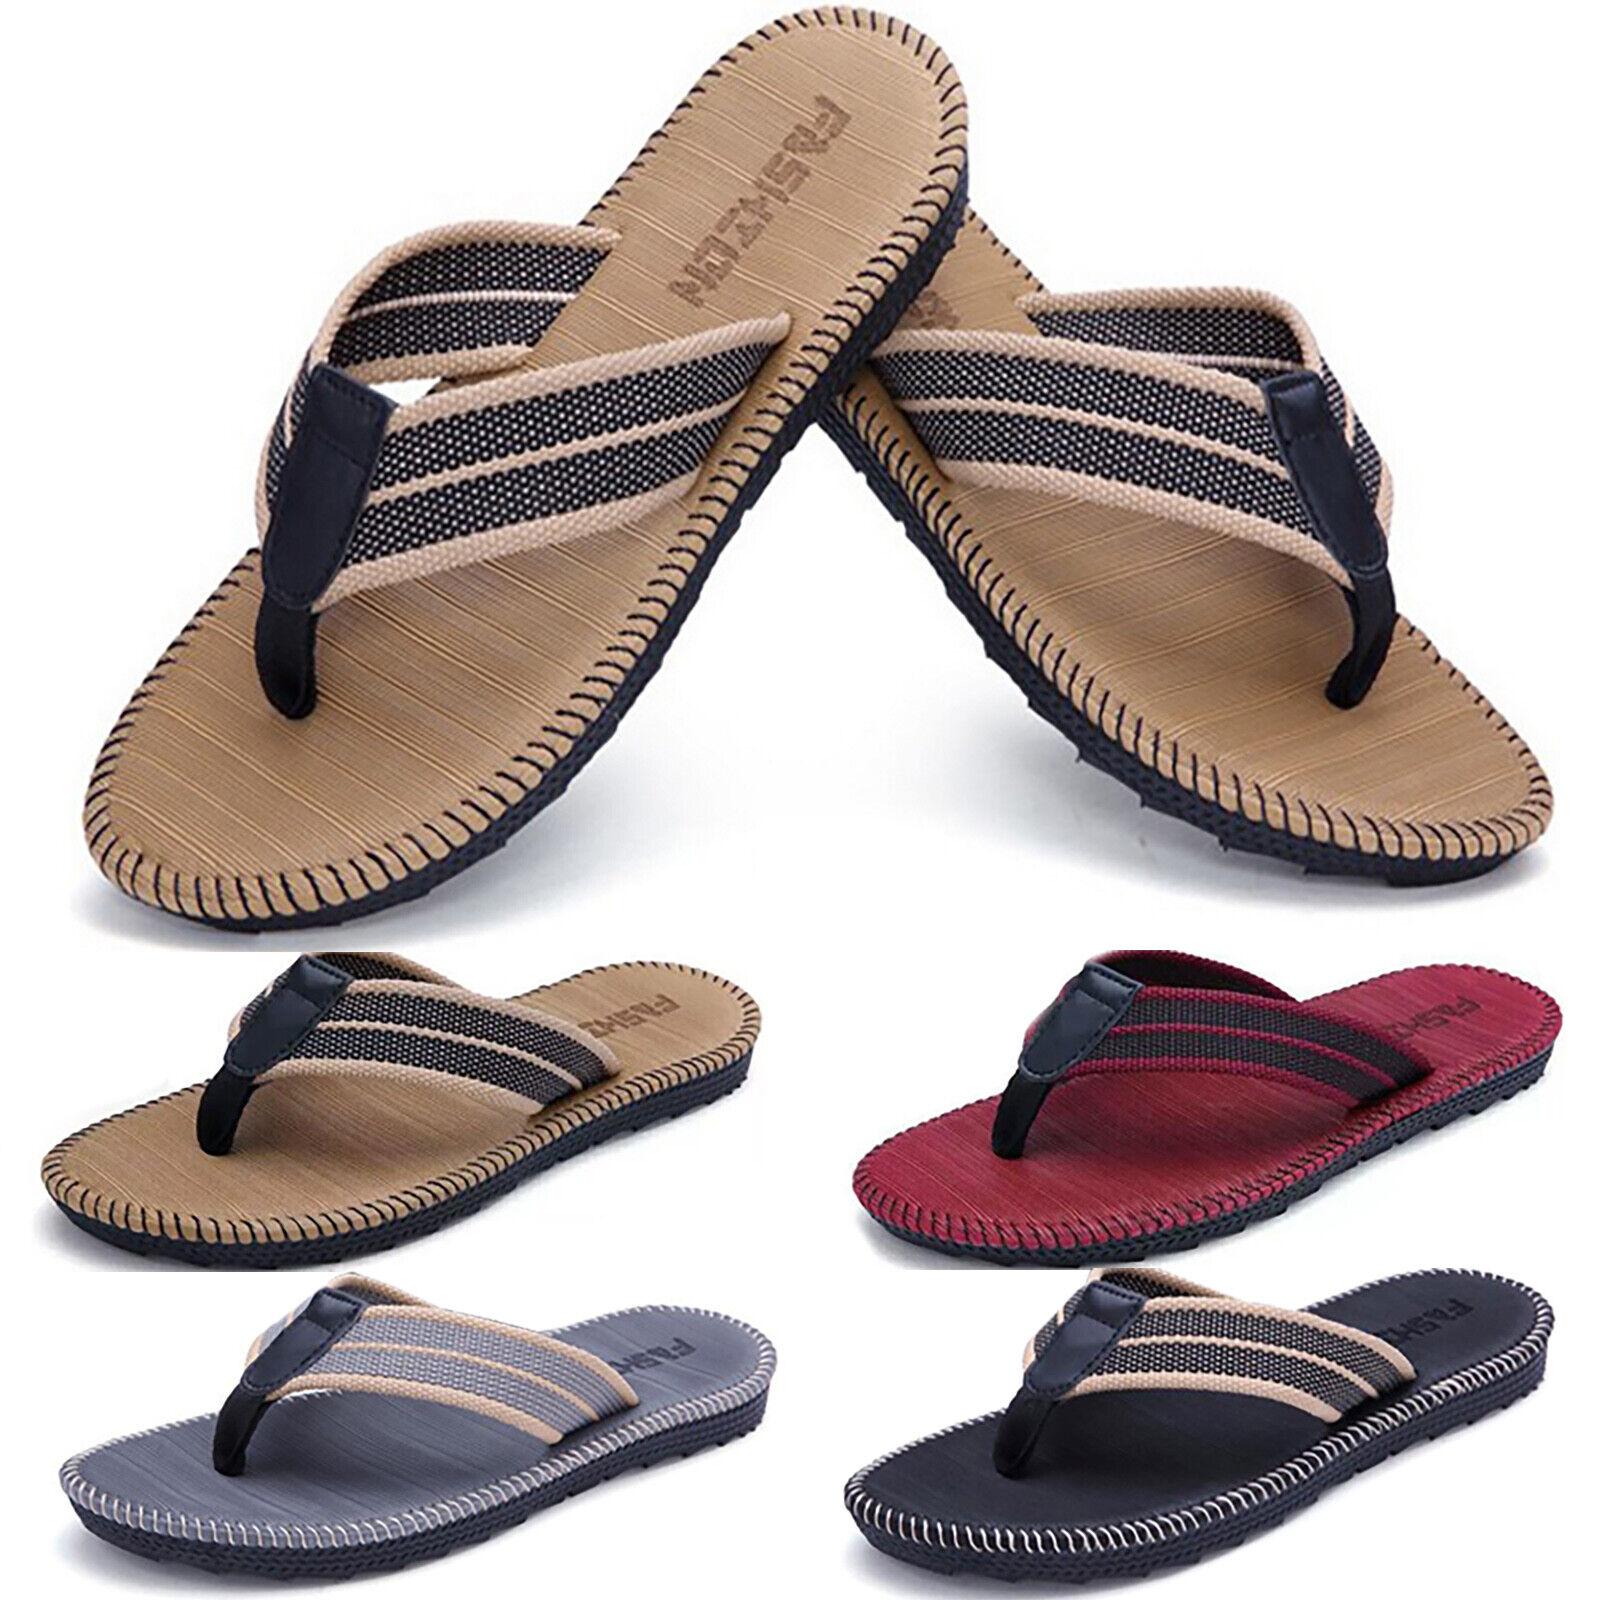 Men's Sandals Flip Flops Beach Pool Thongs Casual Summer Sport Shower Slippers 1